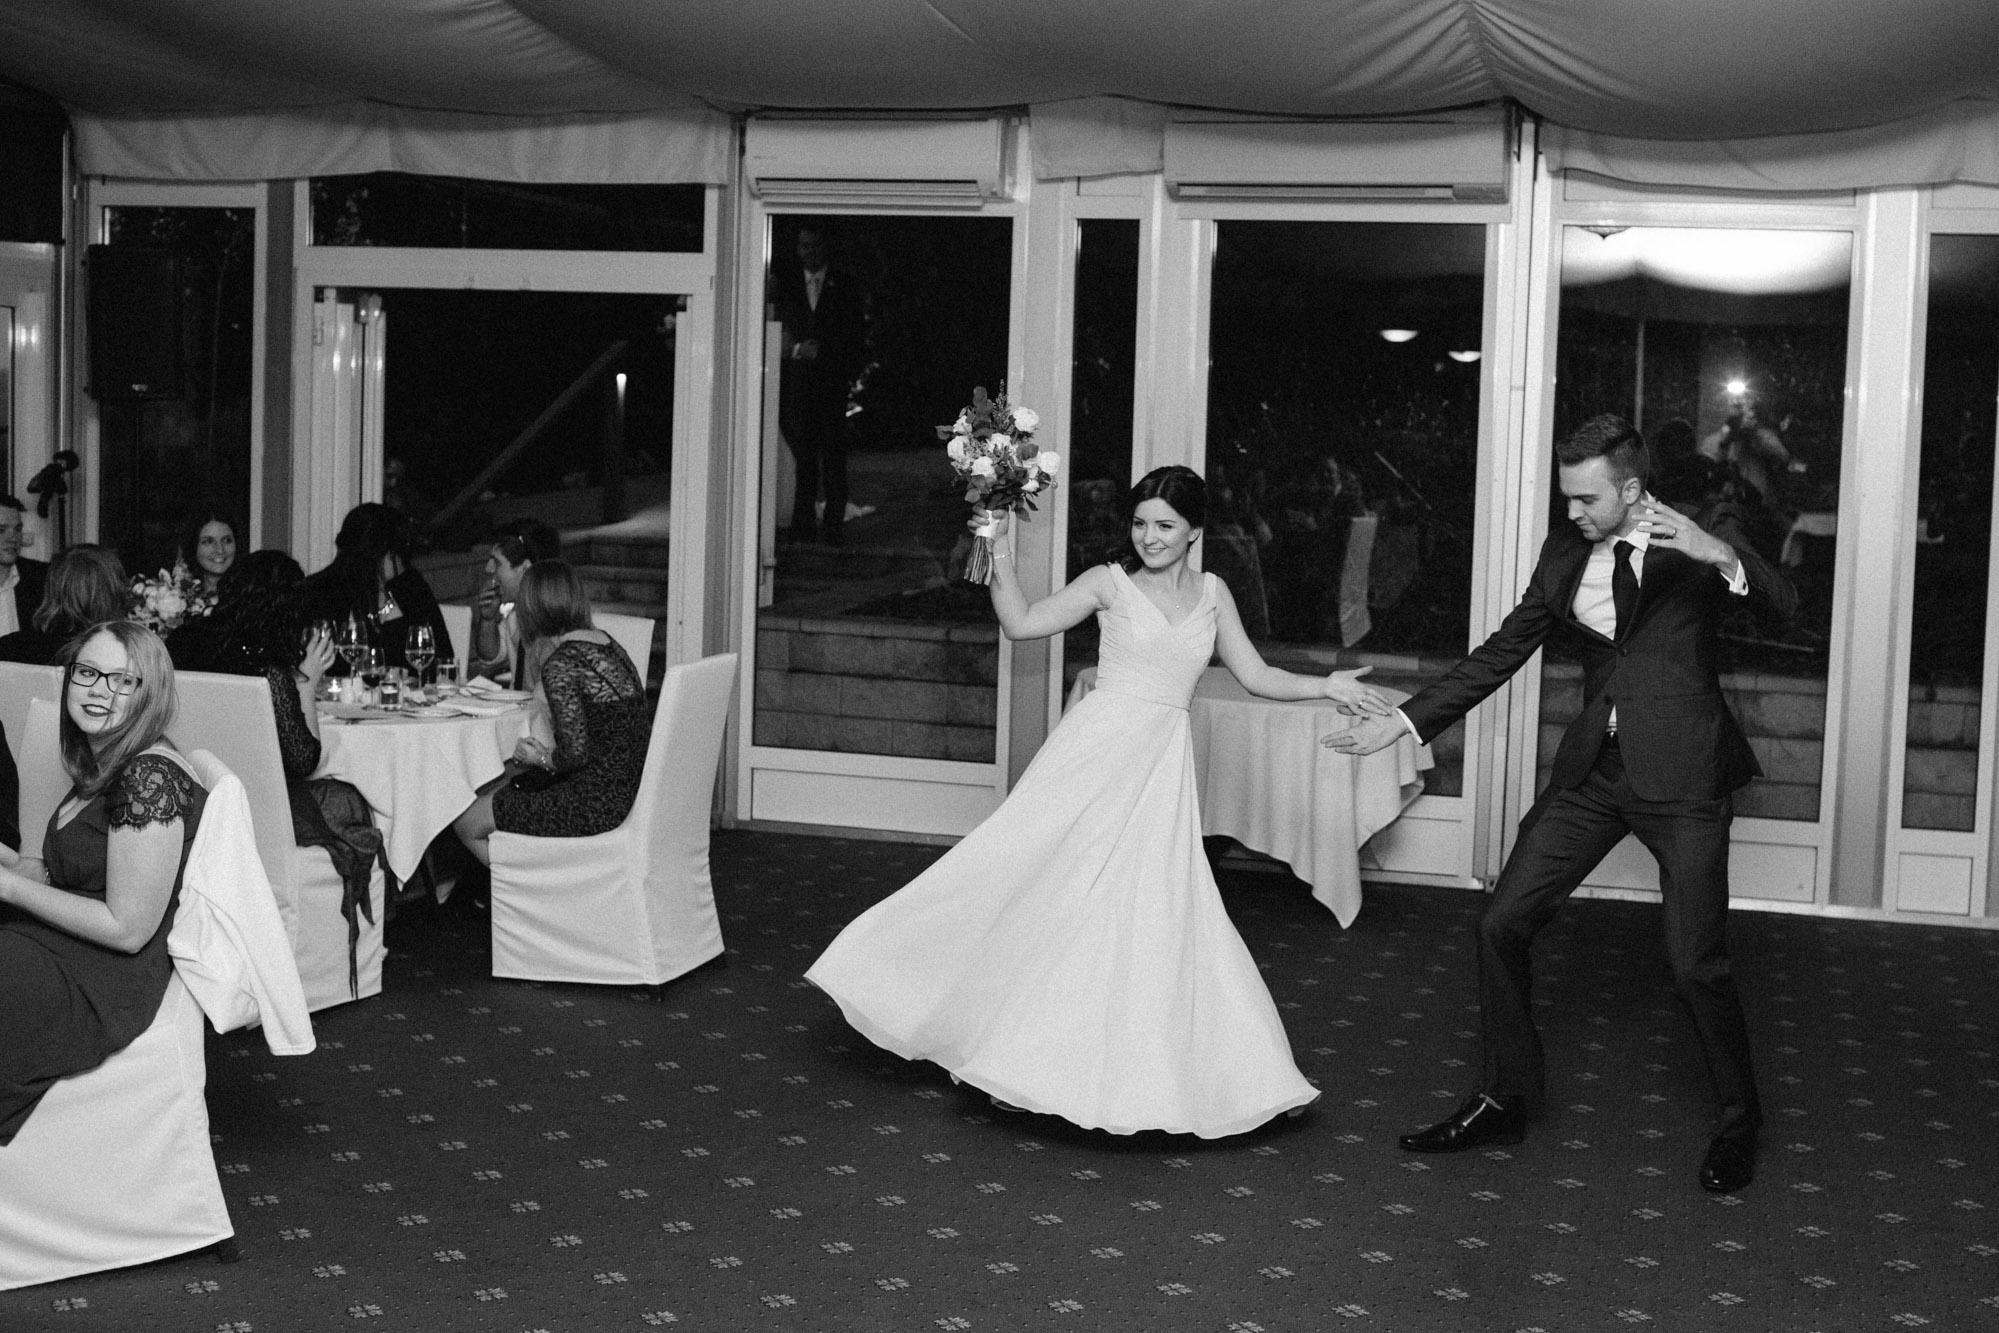 Mount-Lofty-House-wedding-photography-088.jpg